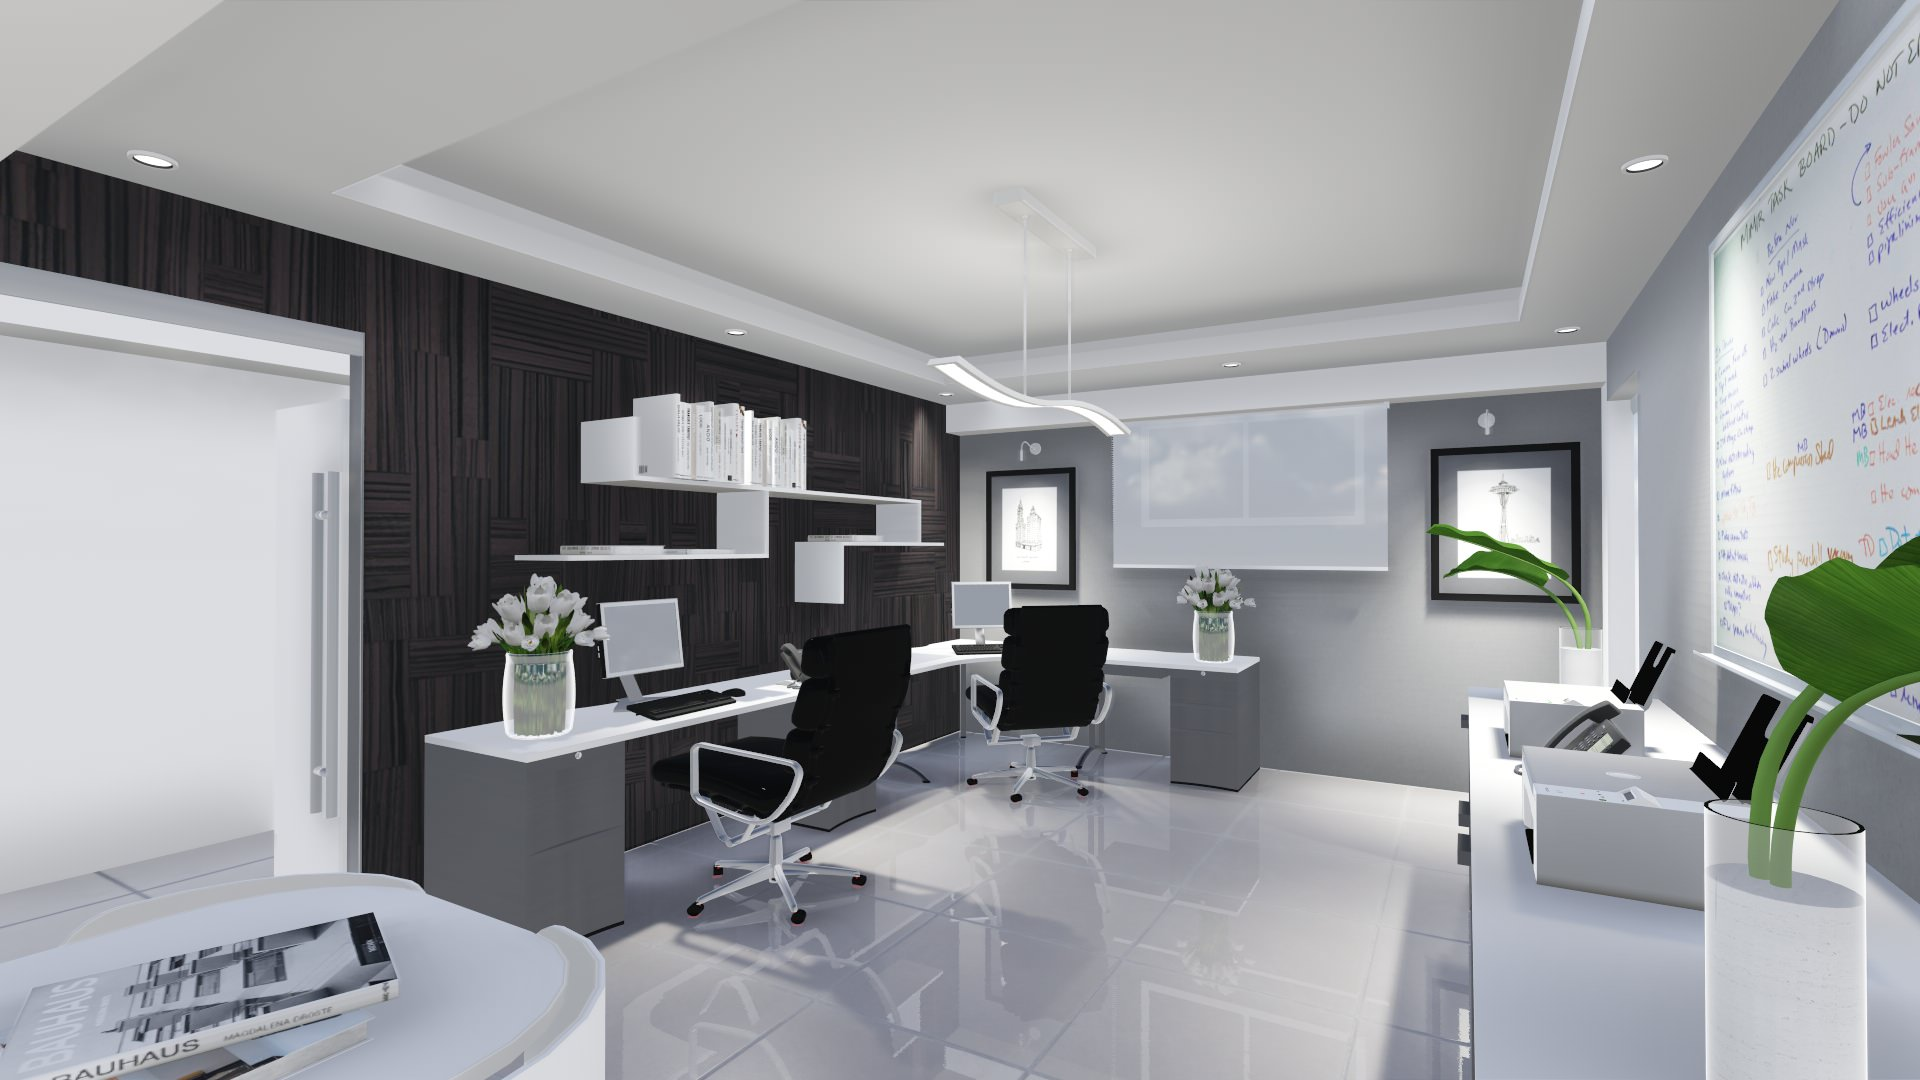 Proyecto oficina alco inmobiliaria neuarq for Proyecto oficina